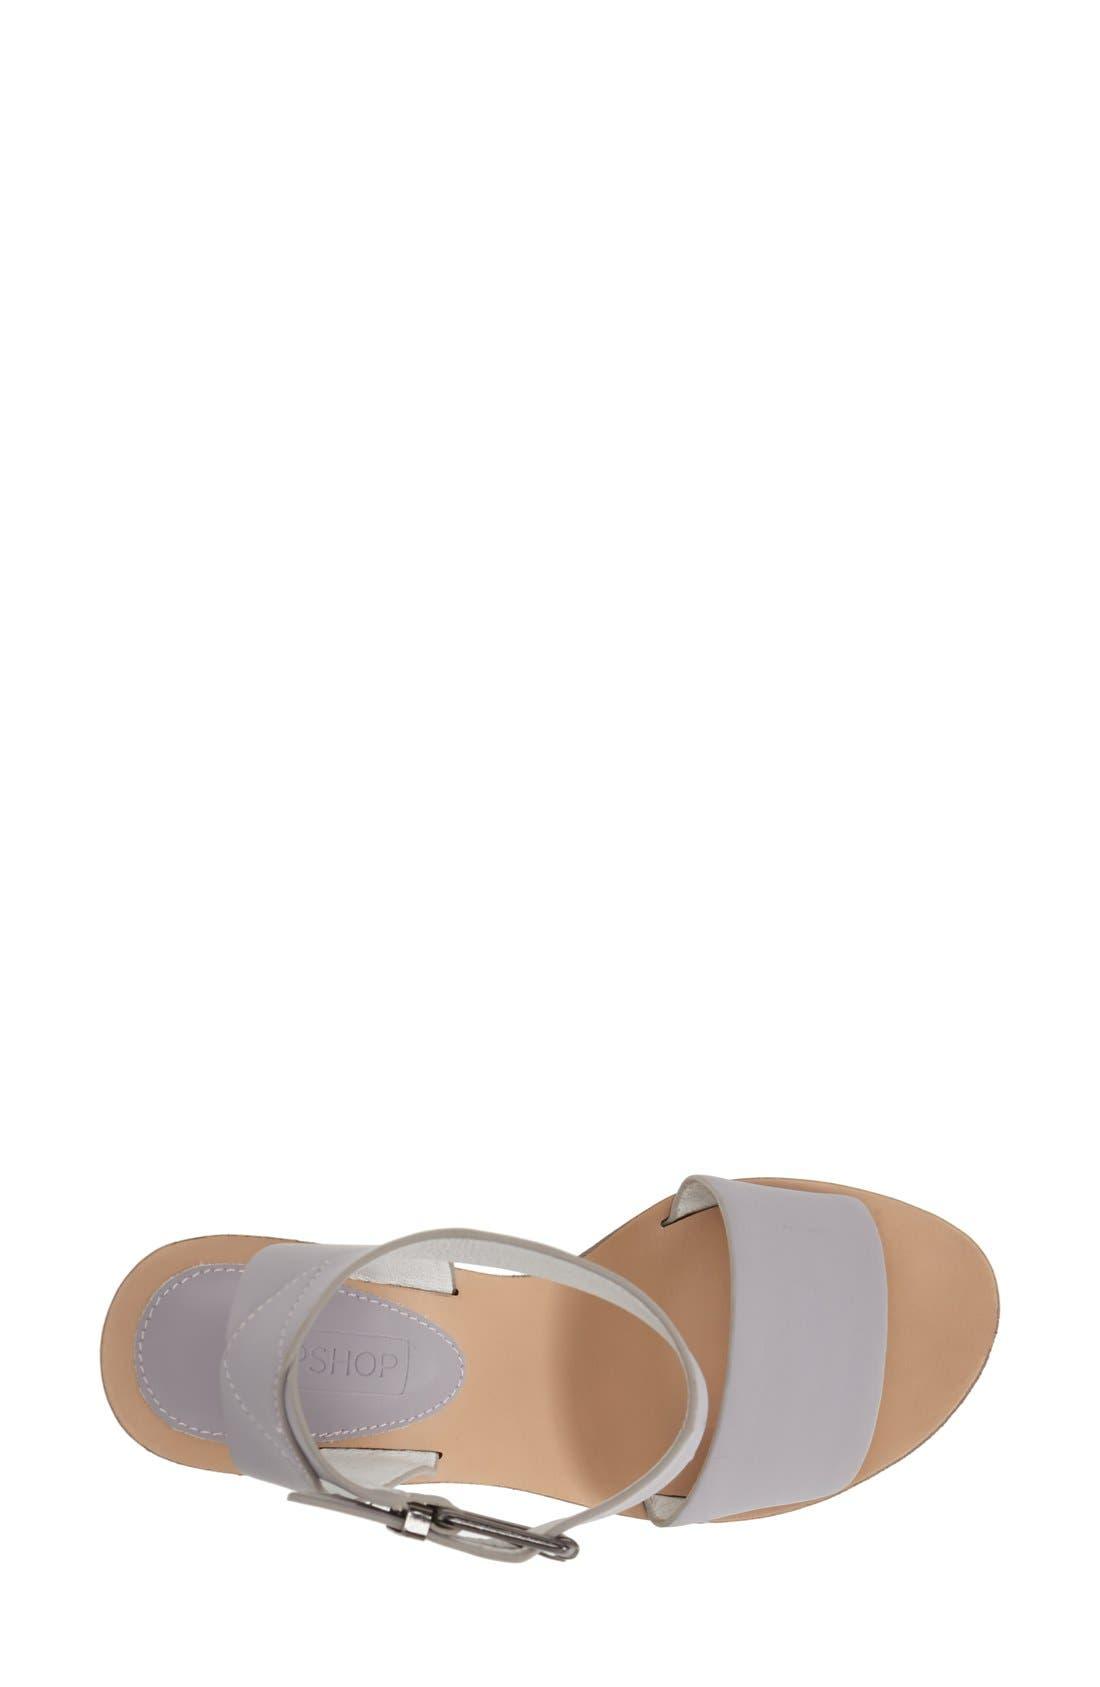 Alternate Image 3  - Topshop 'Waffle' Platform Wedge Sandal (Women)